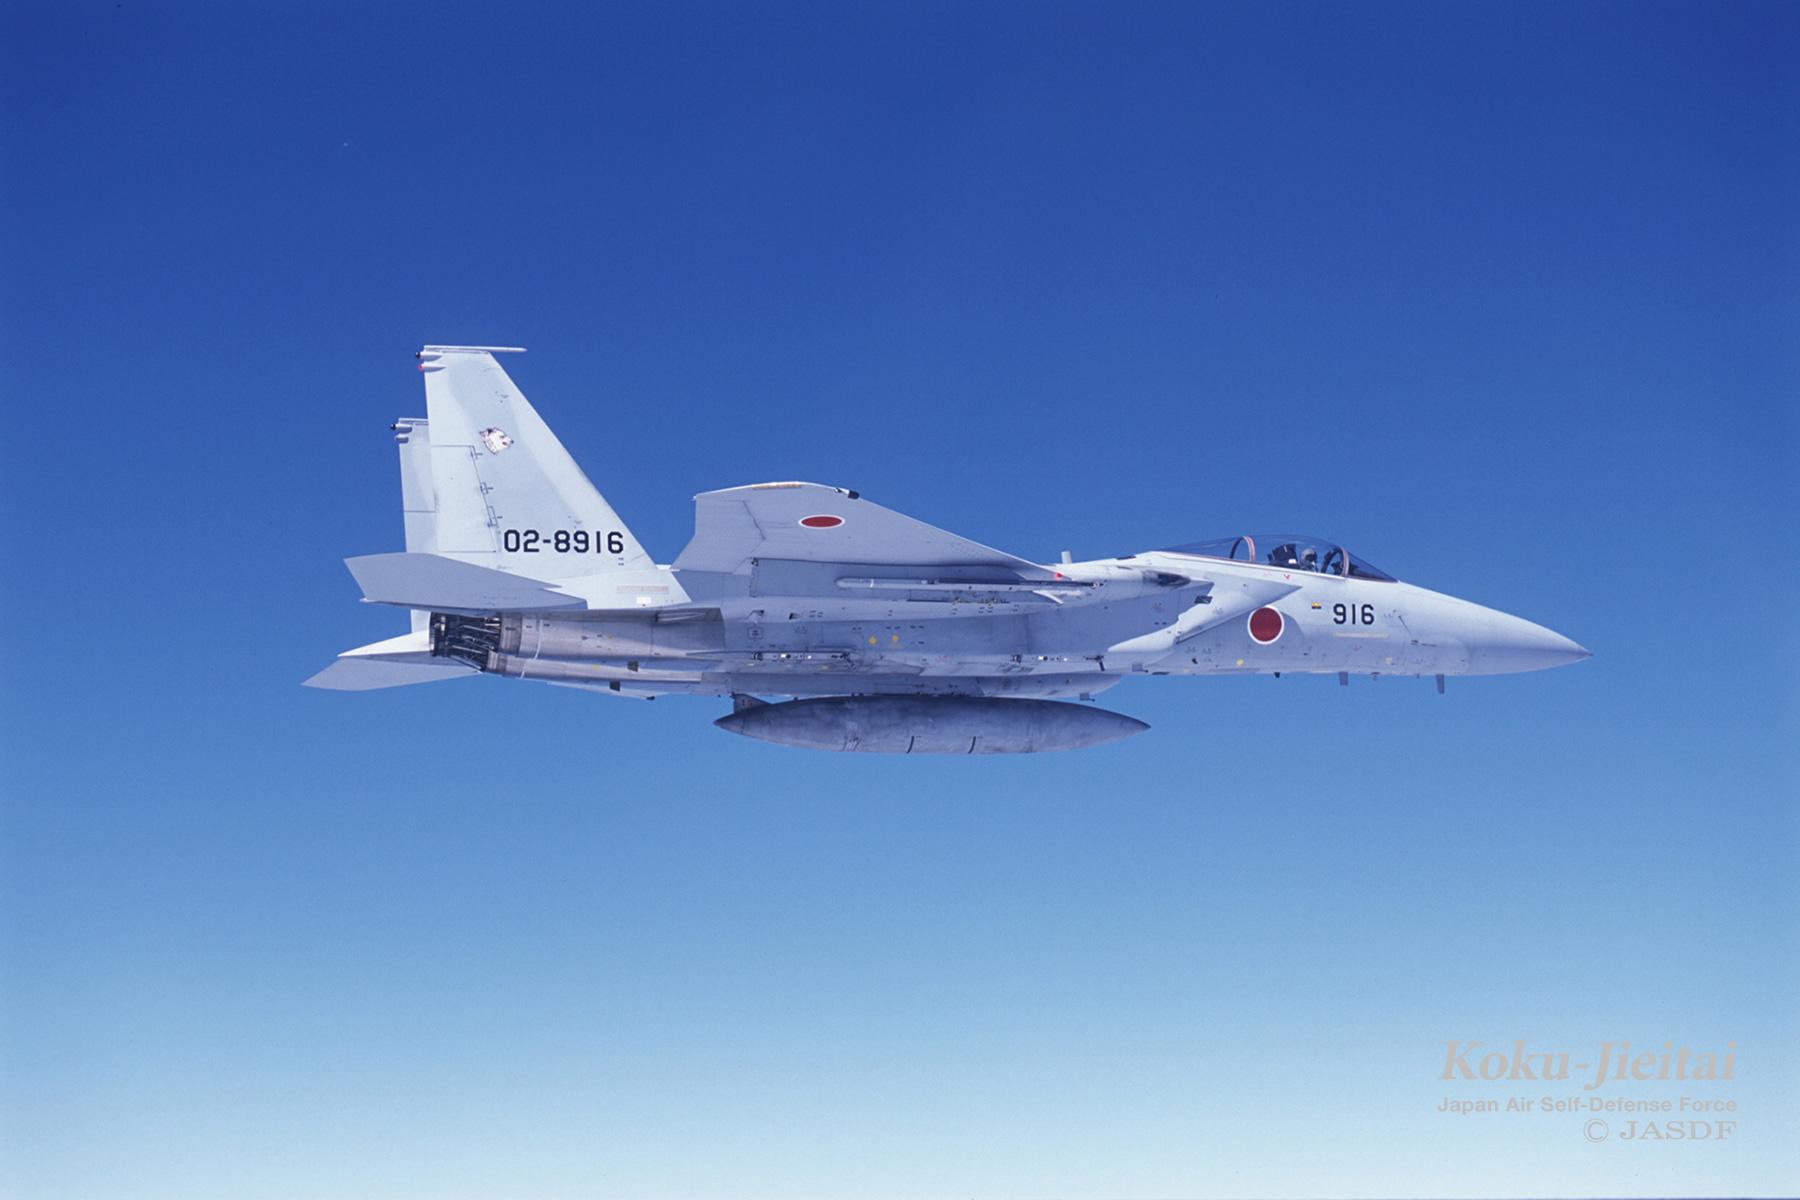 C-2体験搭乗記:その3_b0015356_13463431.jpg